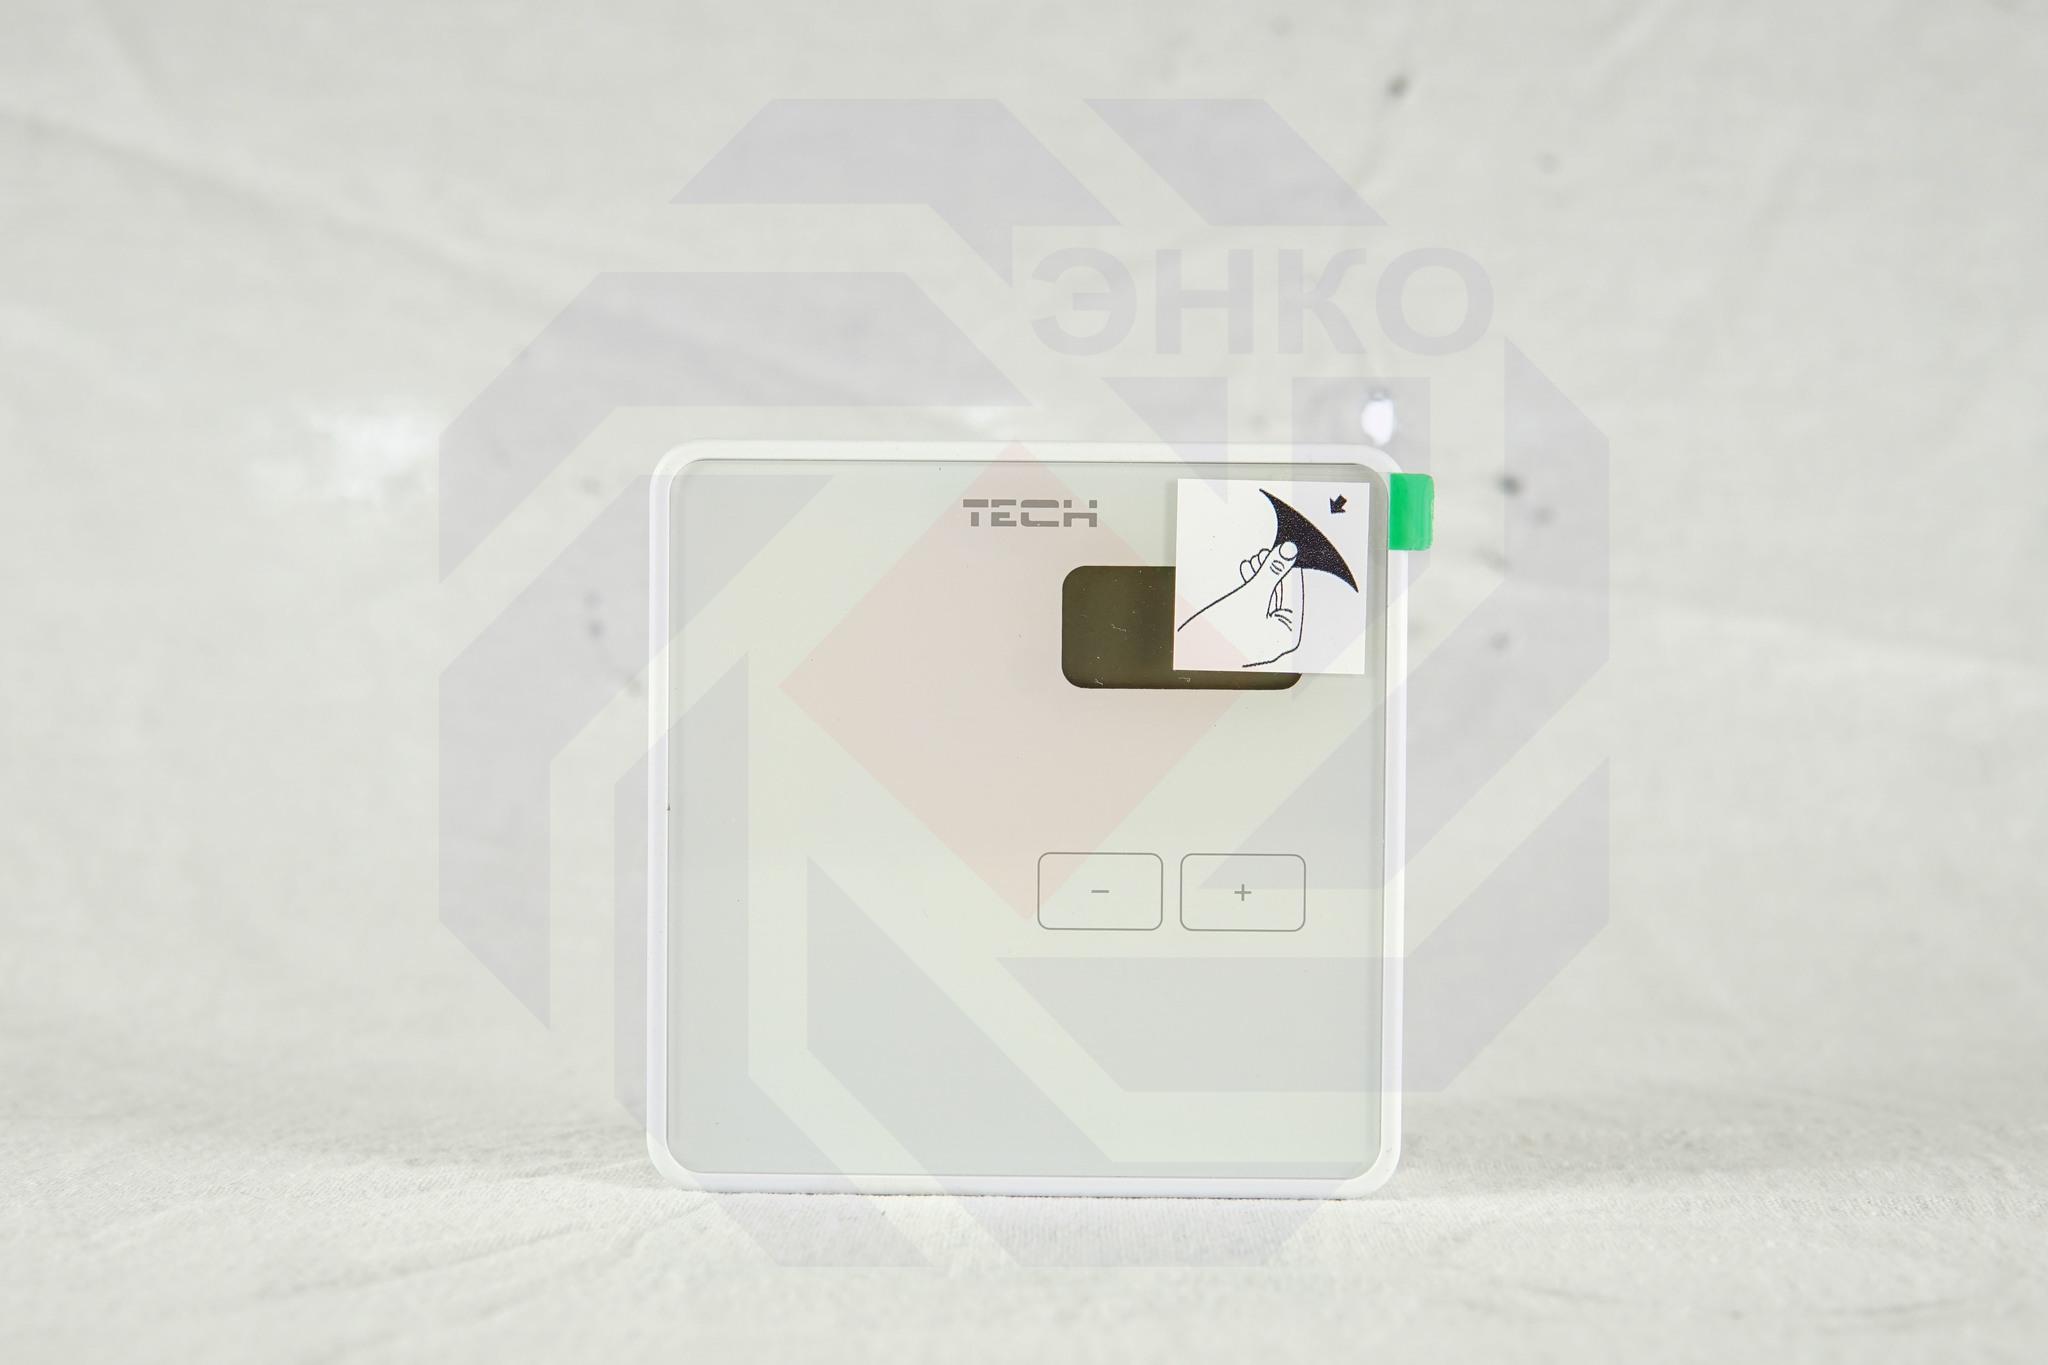 Термостат комнатный TECH STEROWNIKI ST-294 V1 белый